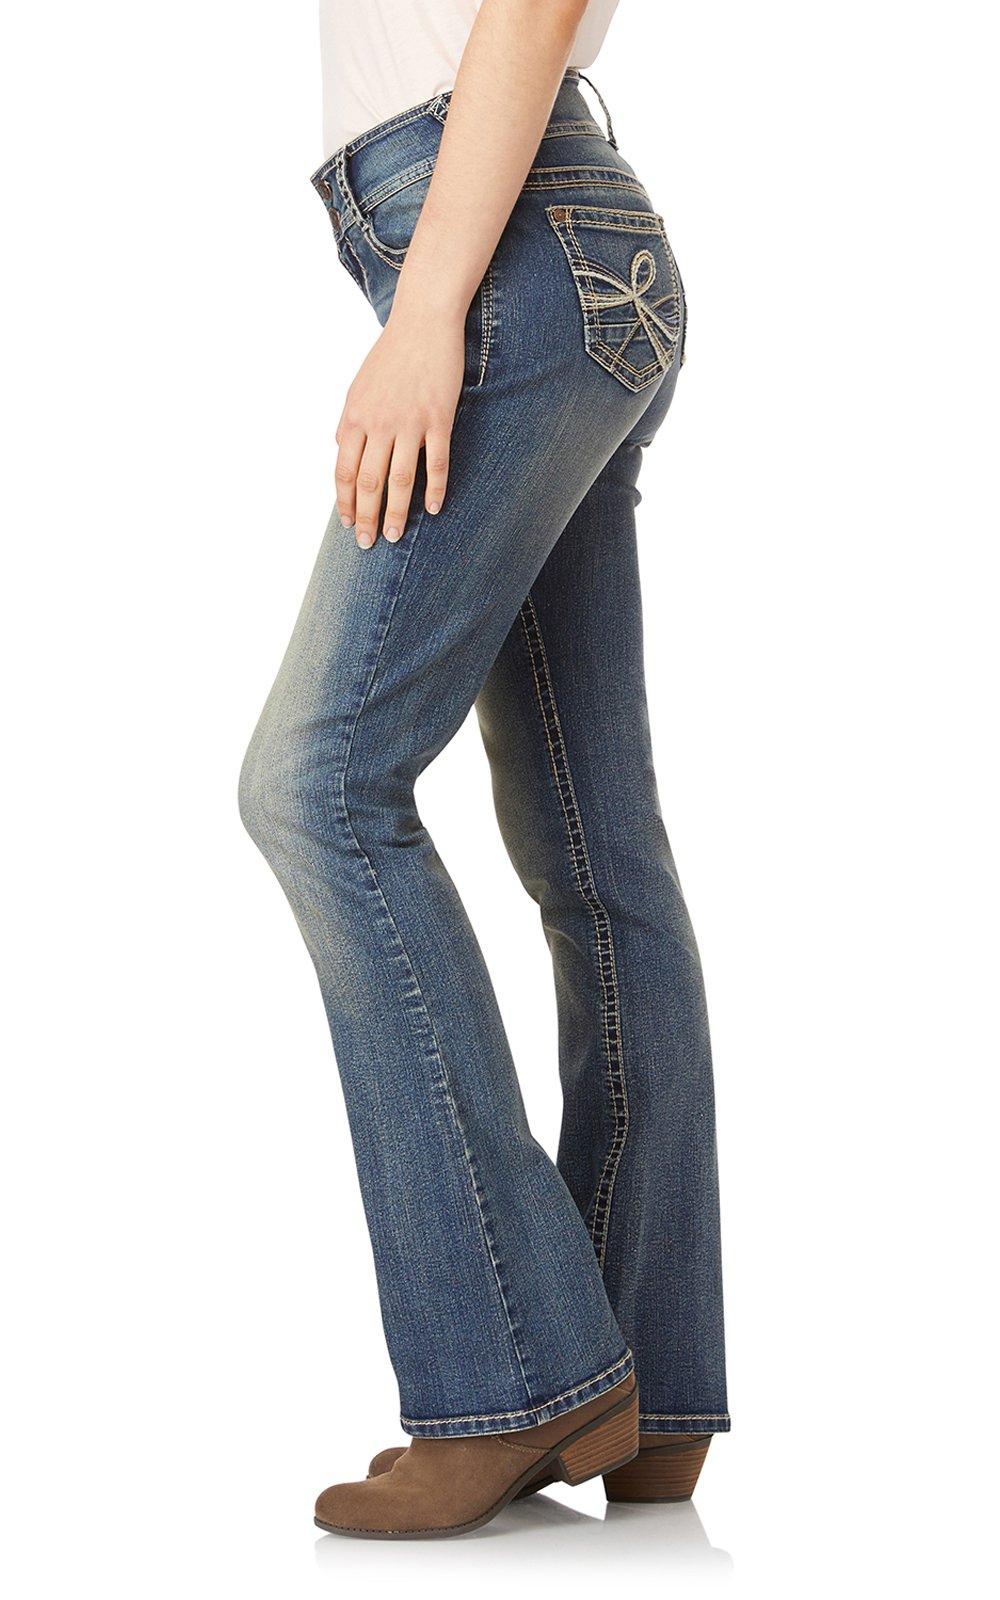 WallFlower Jeans Junior's Petite InstaStretch Luscious Curvy Bootcut, Basil, 3 Short by WallFlower (Image #3)